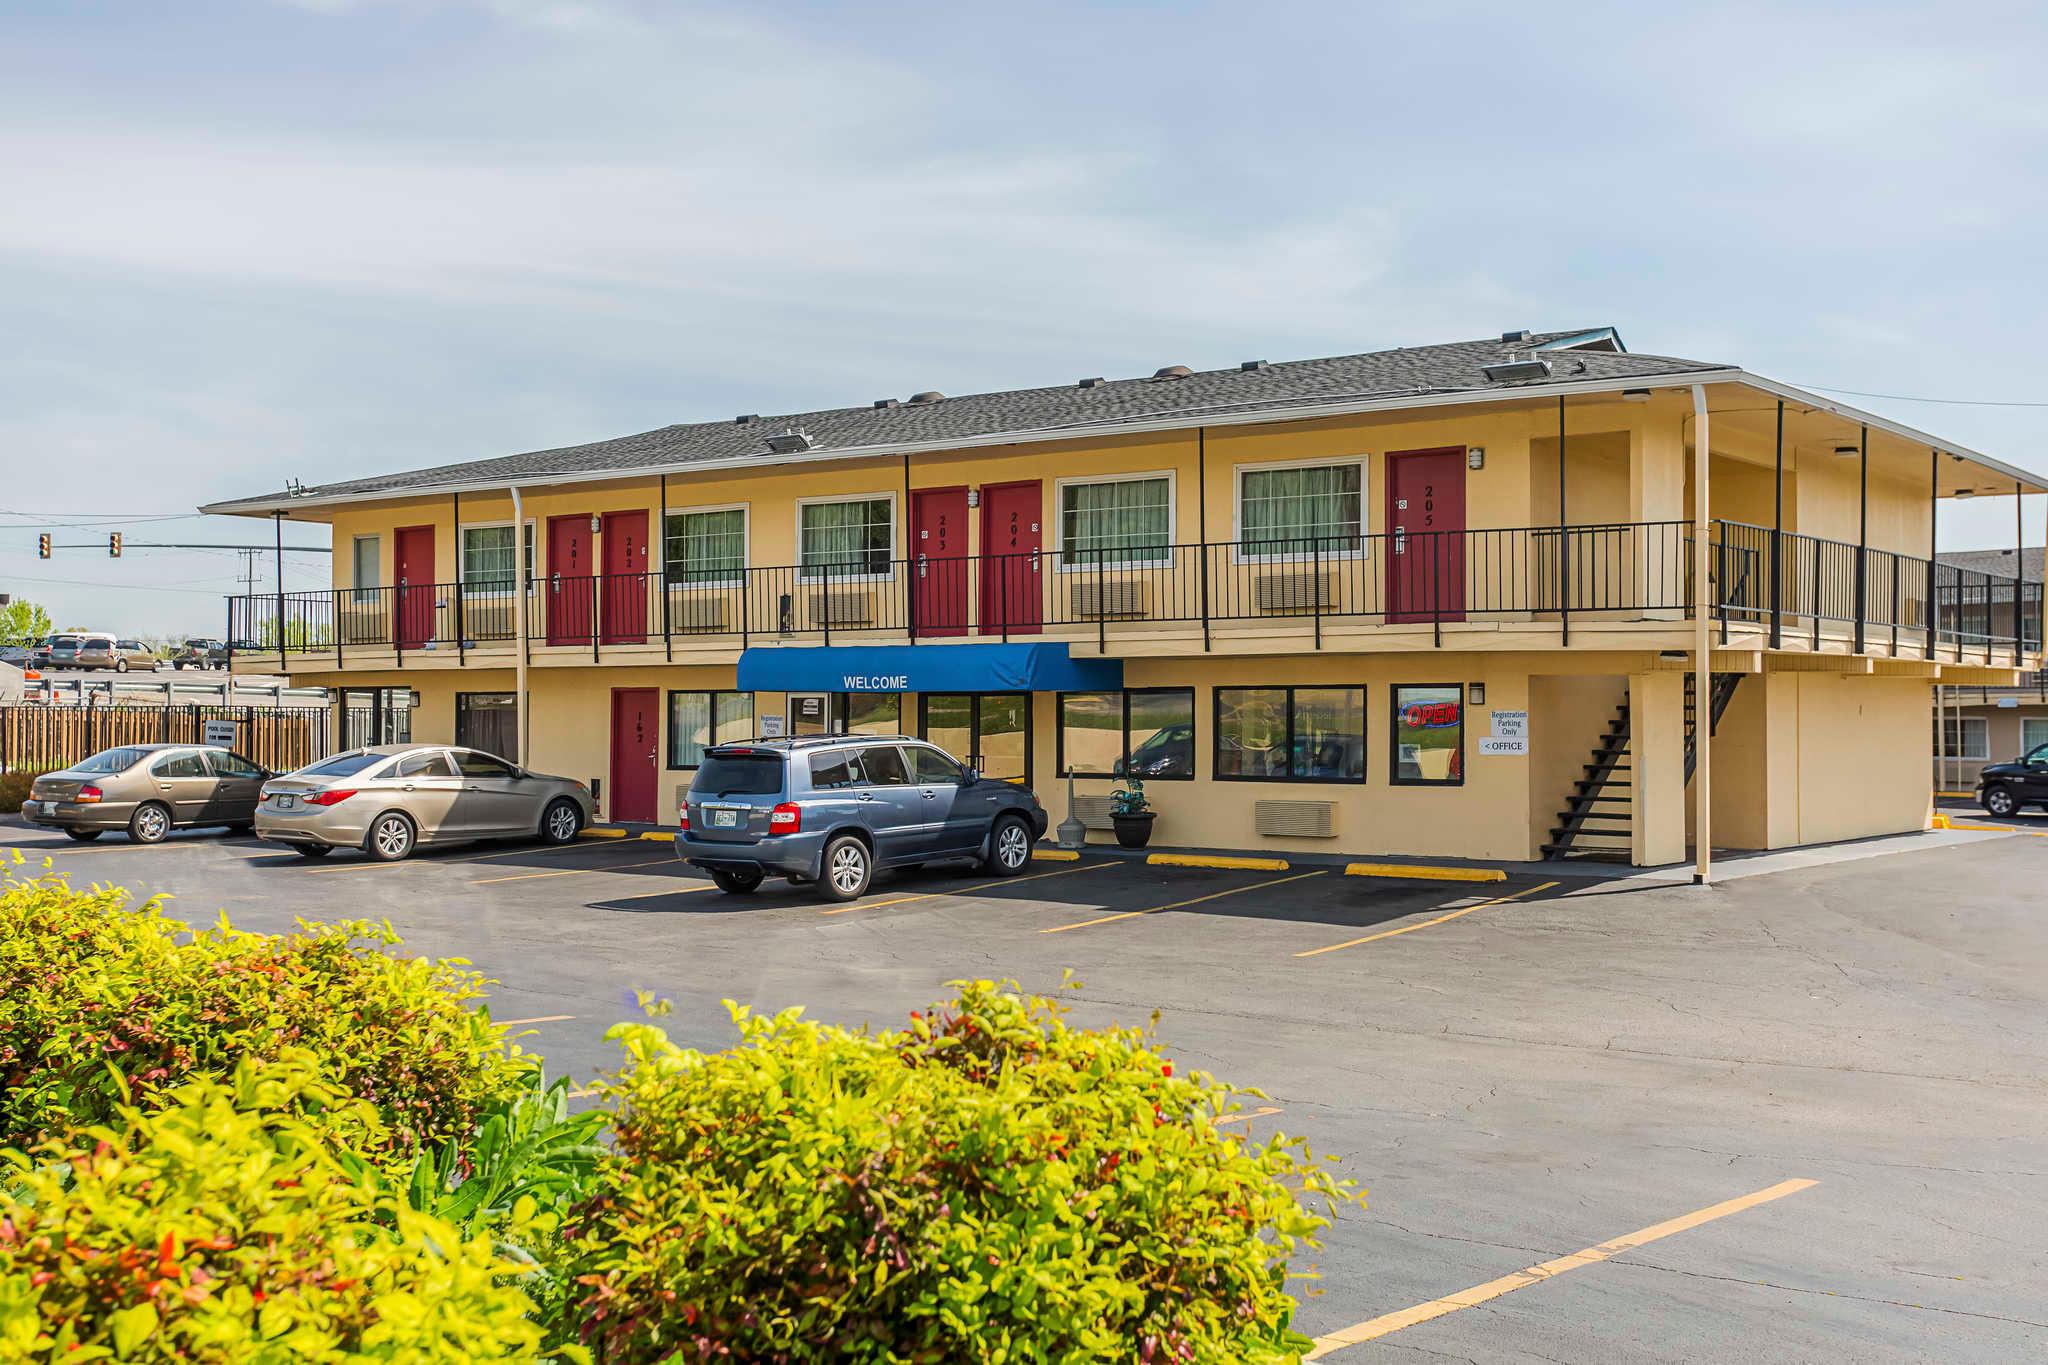 Hotels Near Fairgrounds Nashville Tennessee